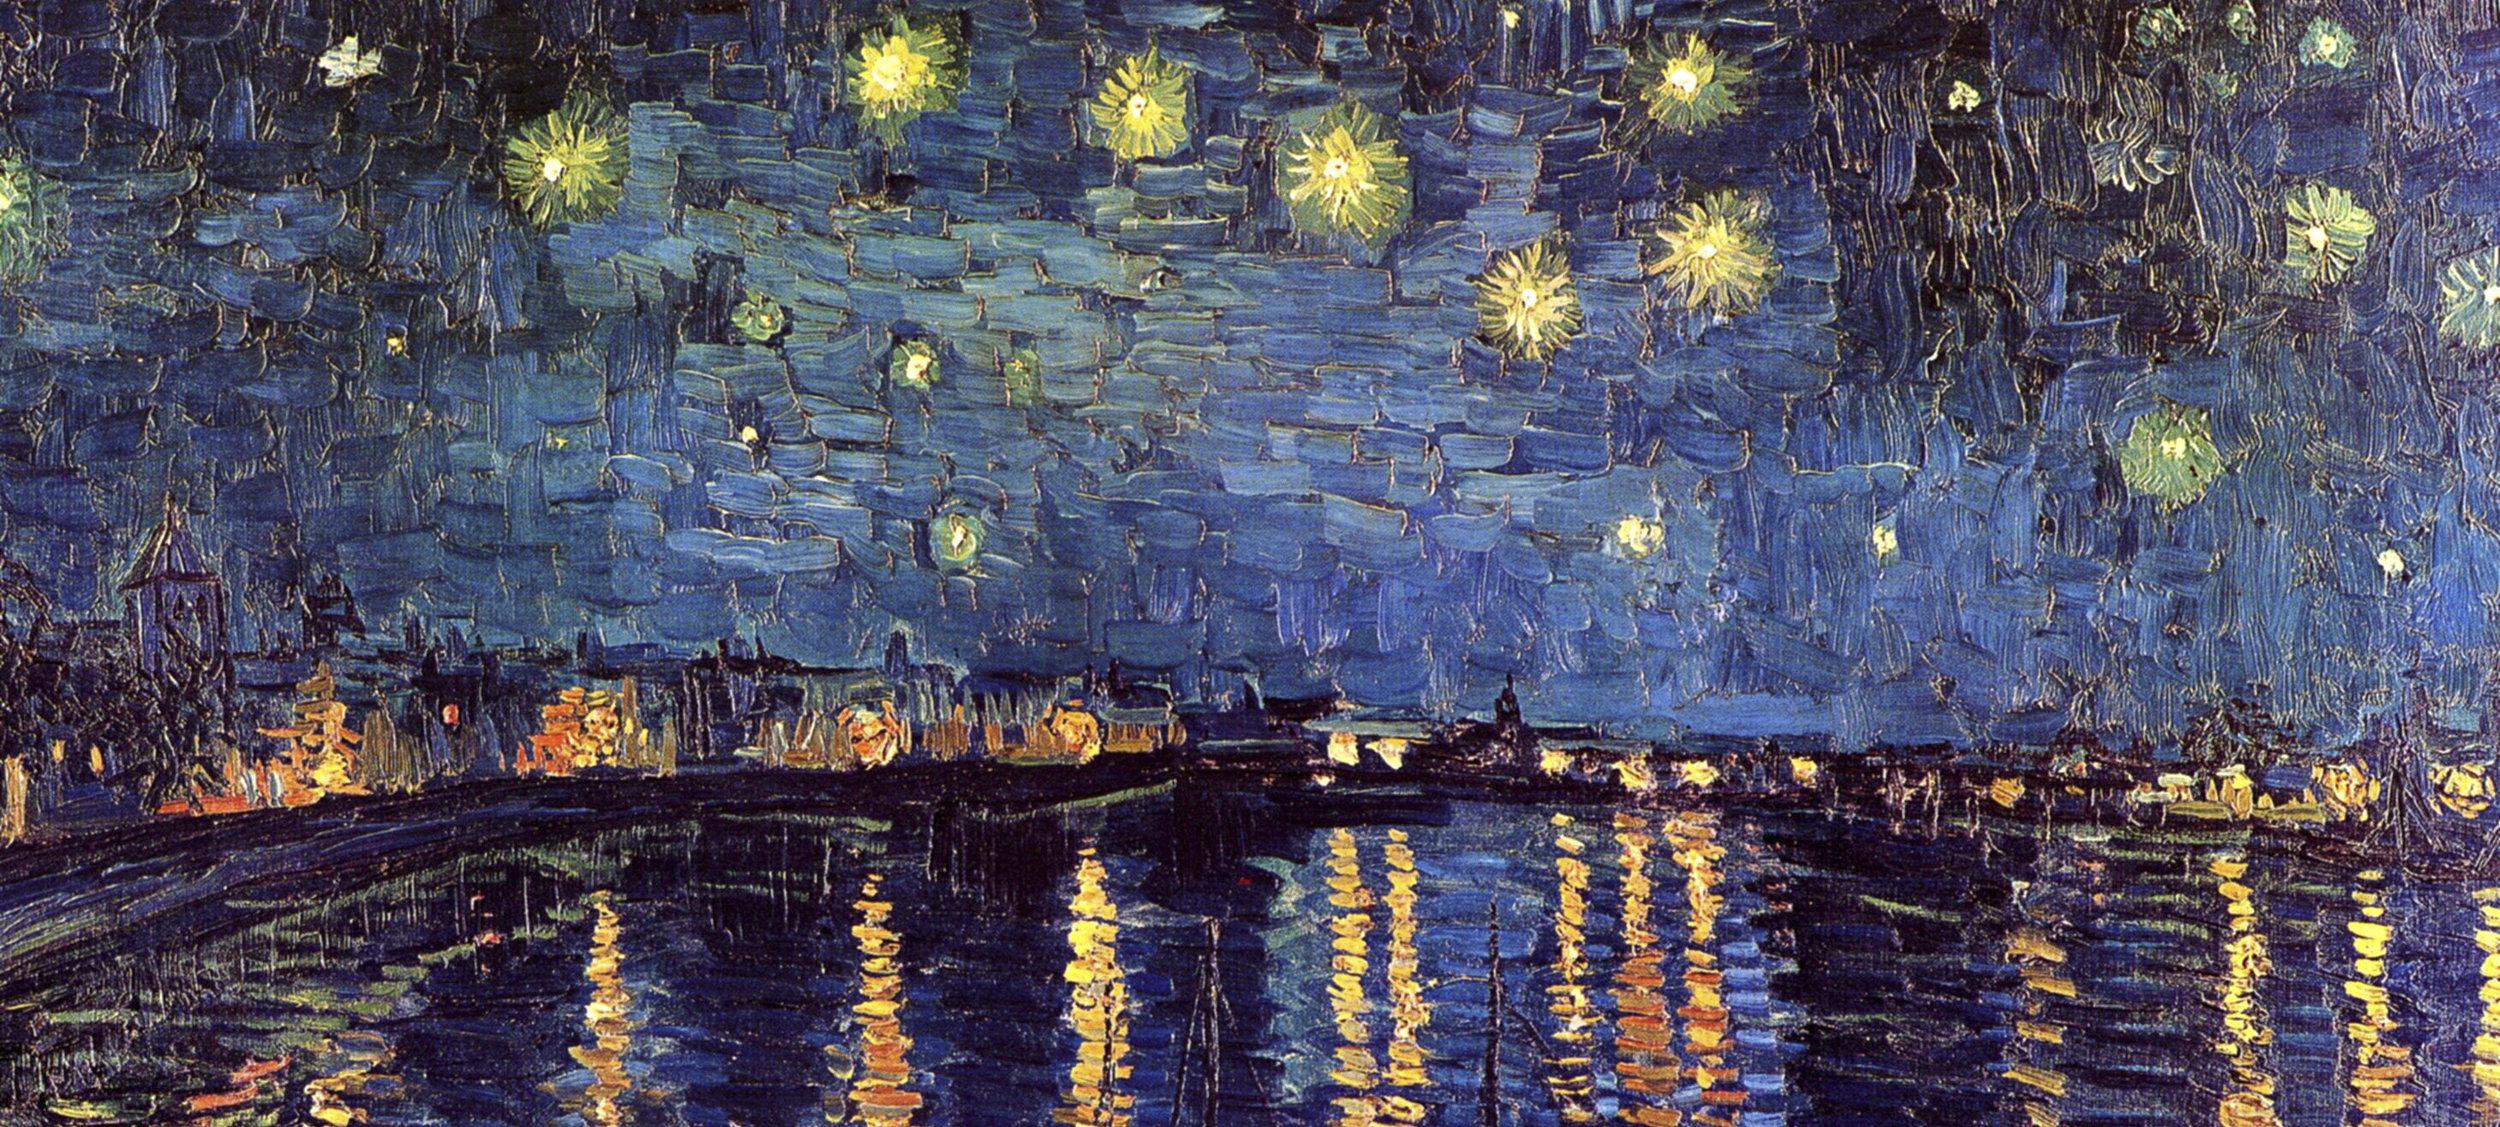 106 Starry Night Over the Rhone copy.jpg